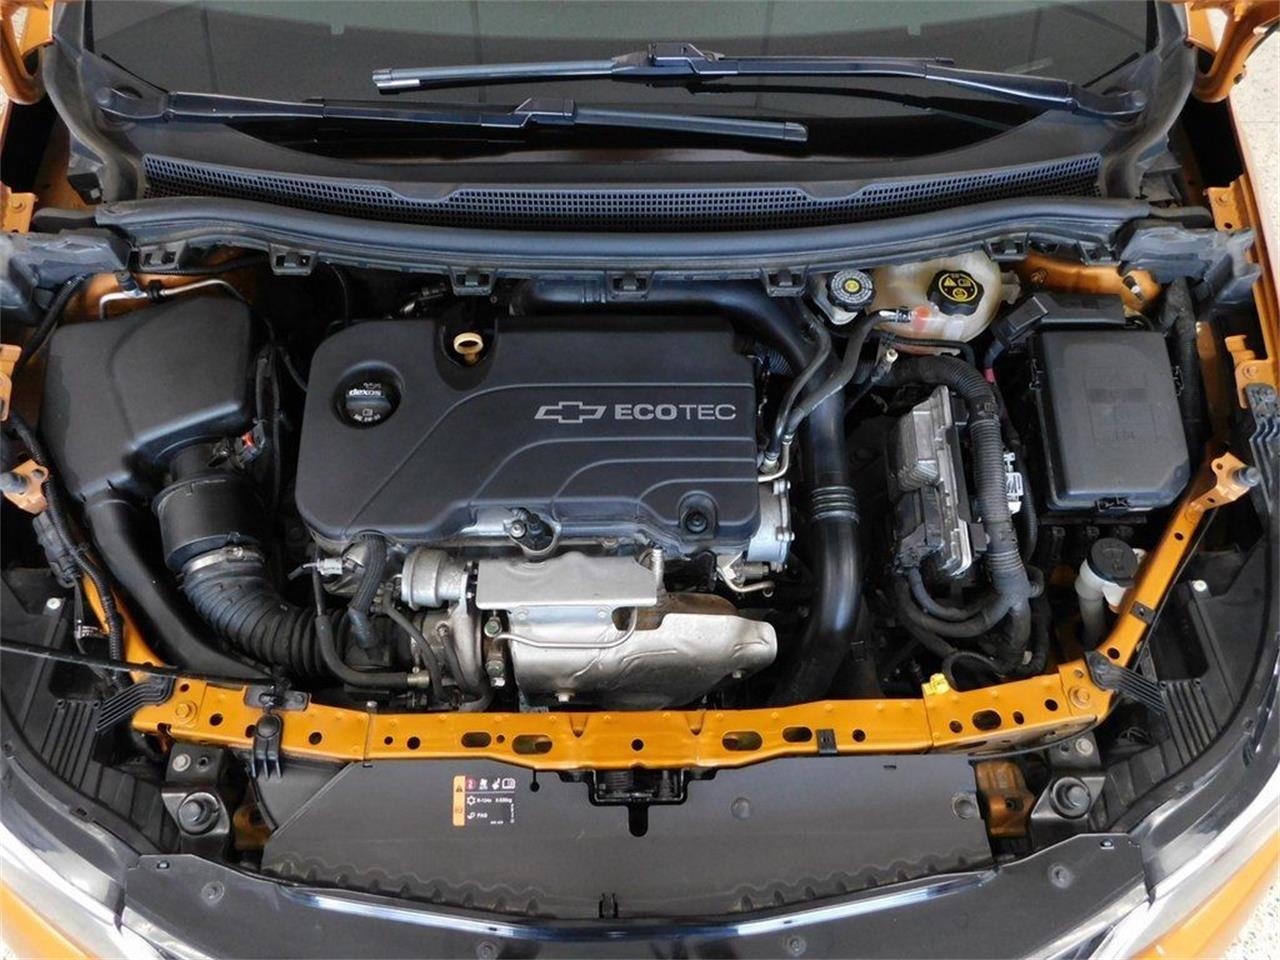 2017 Chevrolet Cruze (CC-1386351) for sale in Hamburg, New York